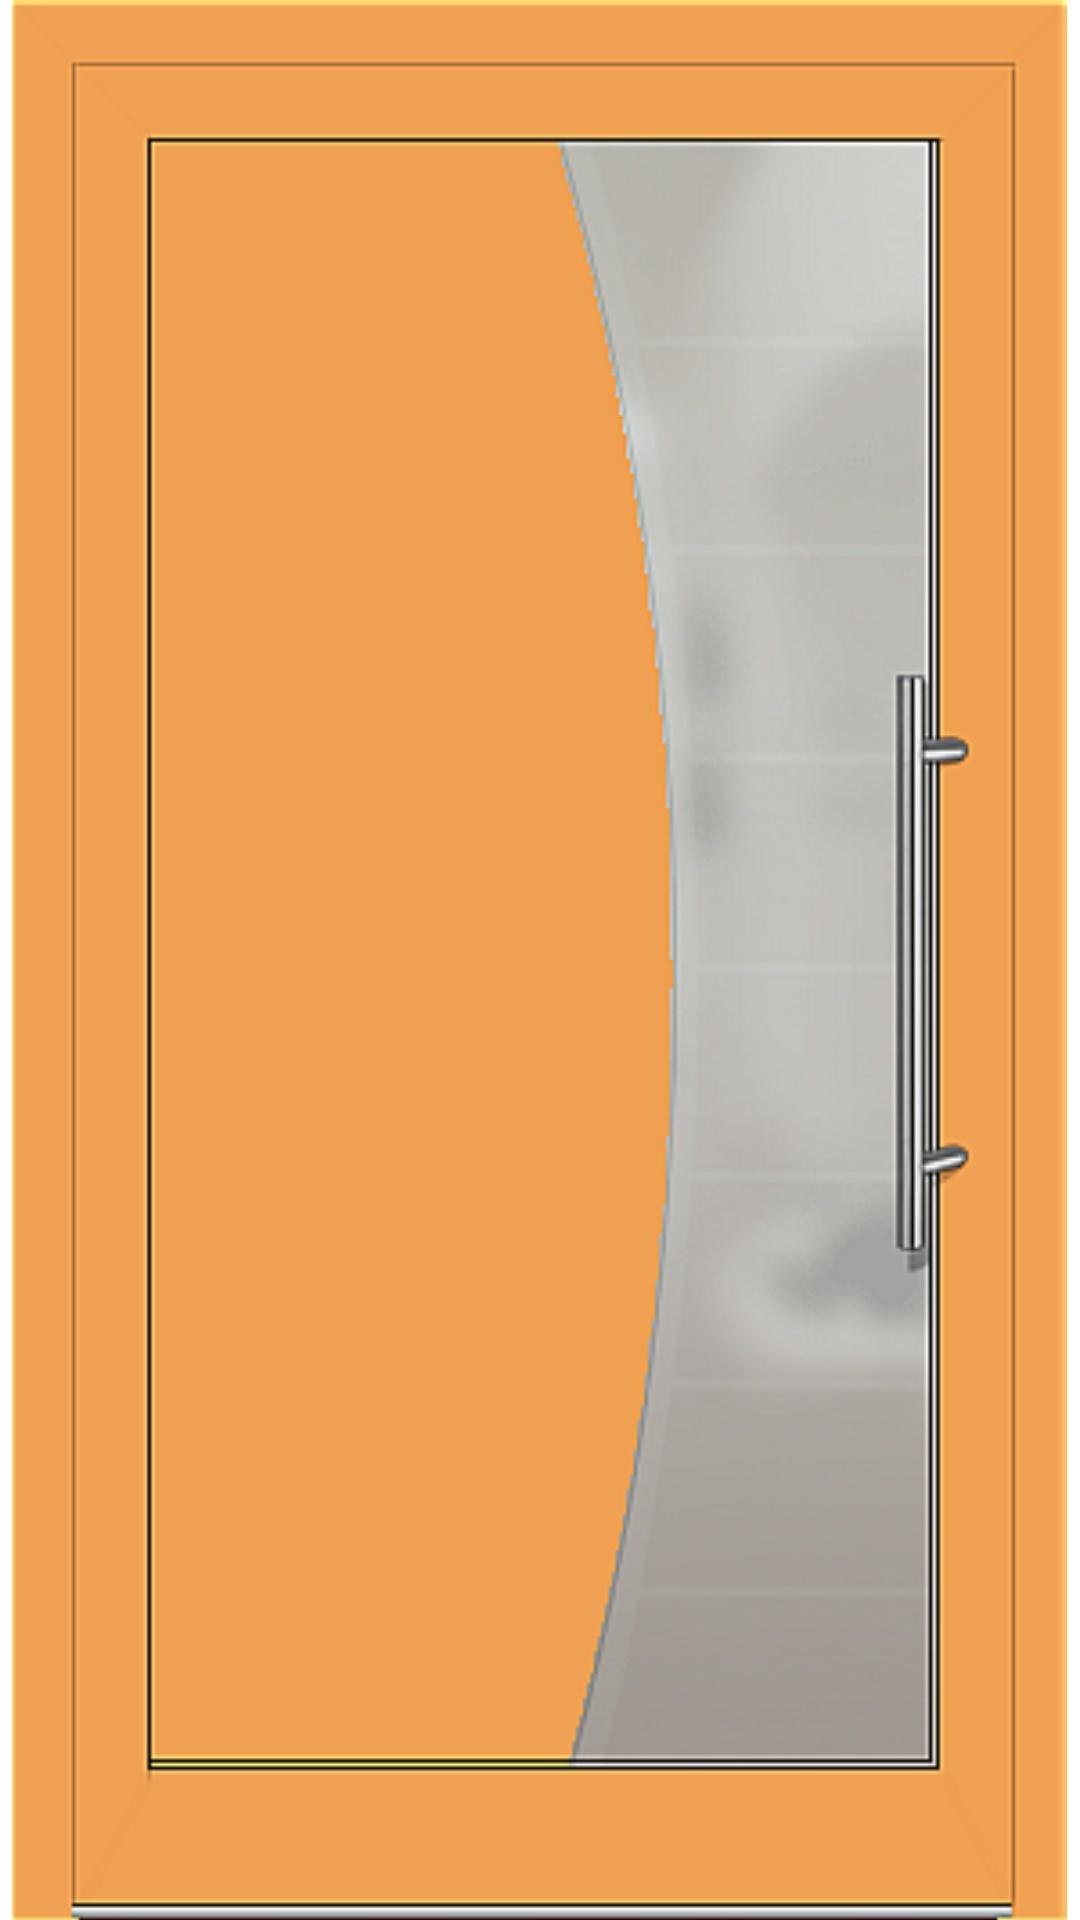 Kunststoff Haustür Modell 6516-50 safrangelb